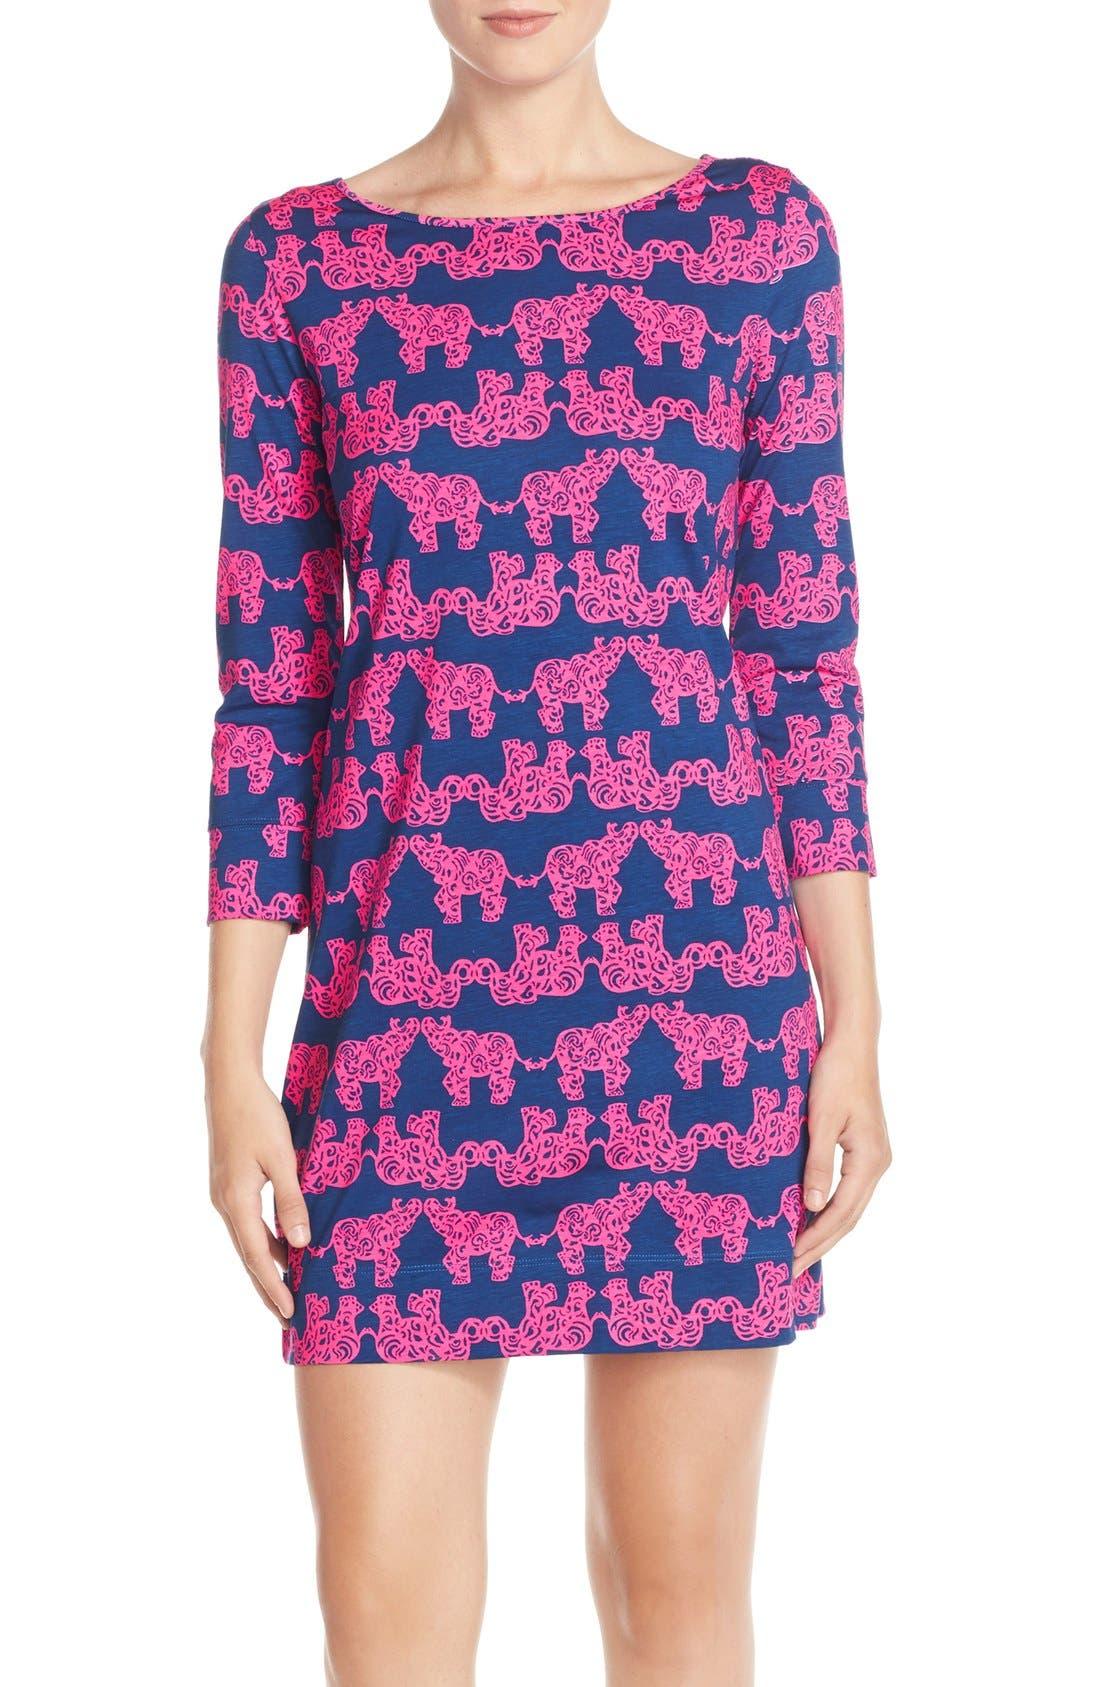 Alternate Image 1 Selected - Lilly Pulitzer® 'Marlowe' Elephant Print PimaCotton Minidress